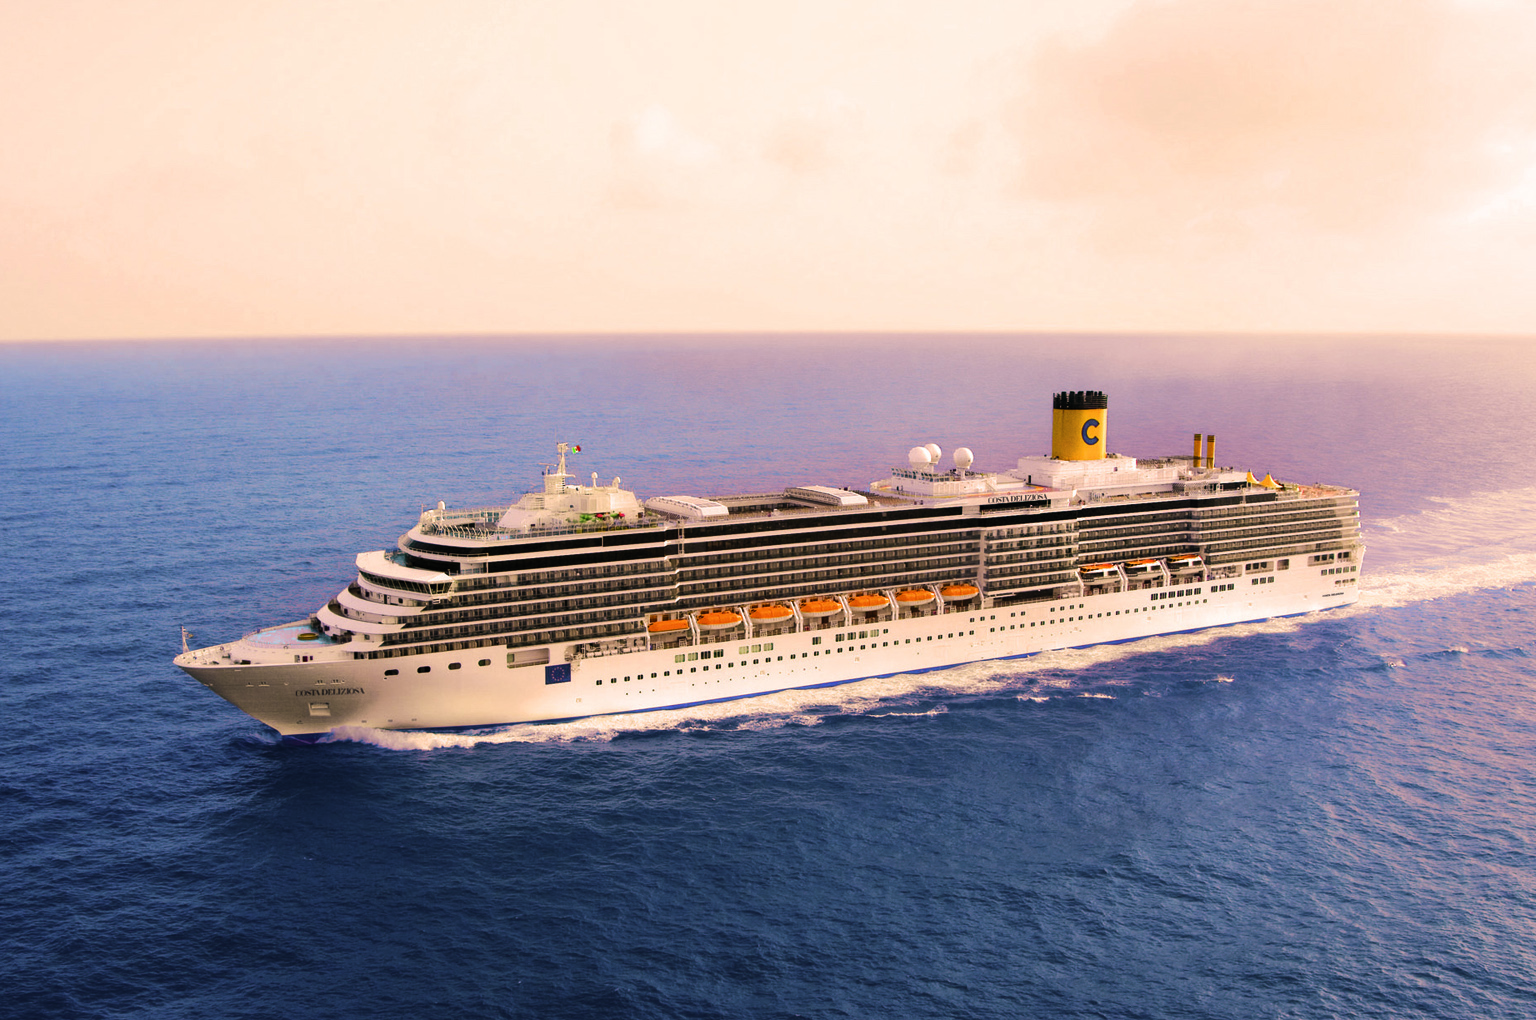 Croaziera 2017 - Mediterana de Est (Venetia) - Costa Cruises - Costa Deliziosa - 7 nopti